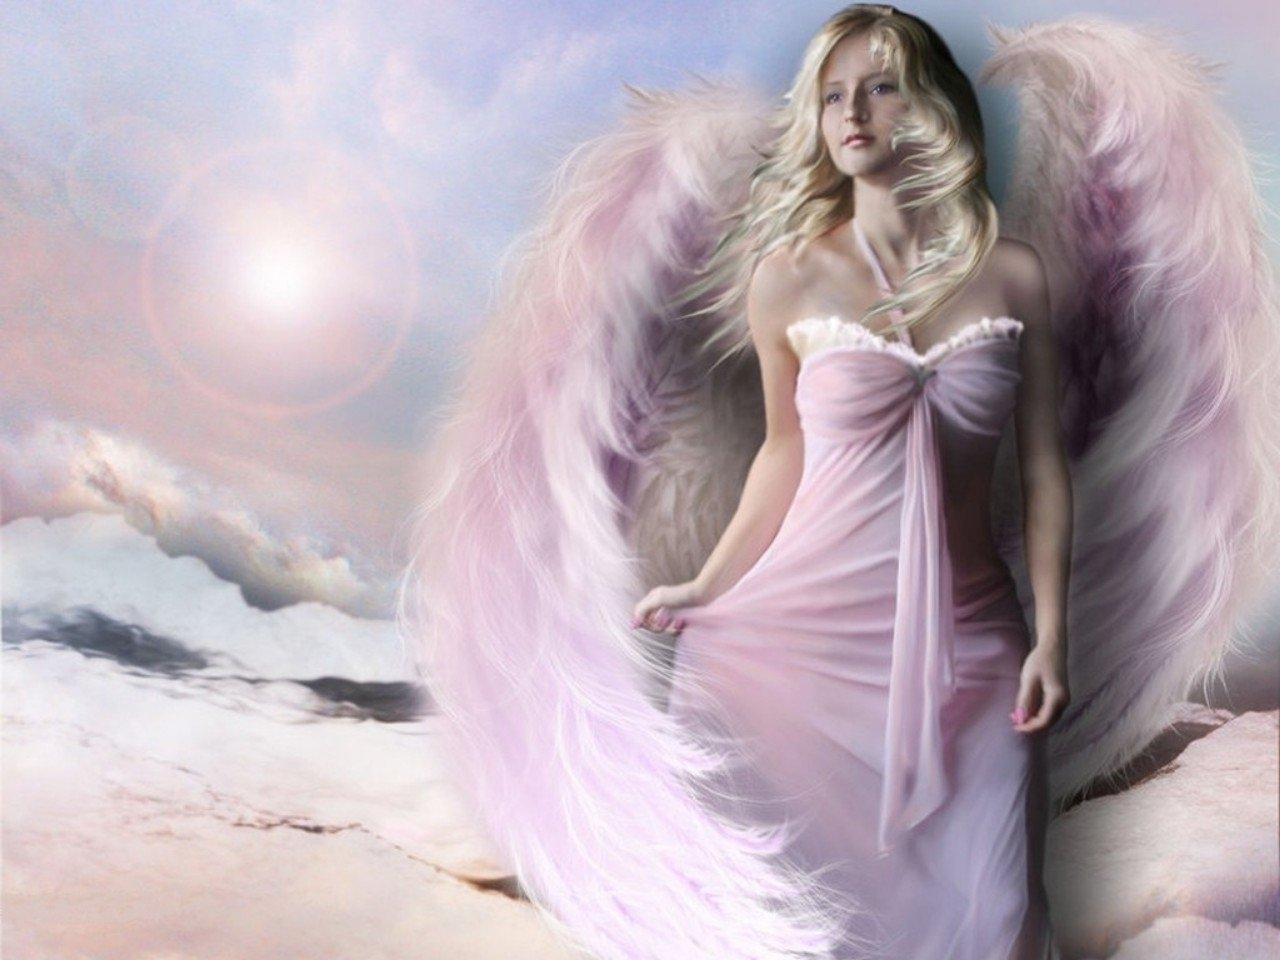 Angel Wallpaper Download Download Wallpaper DaWallpaperz 1280x960